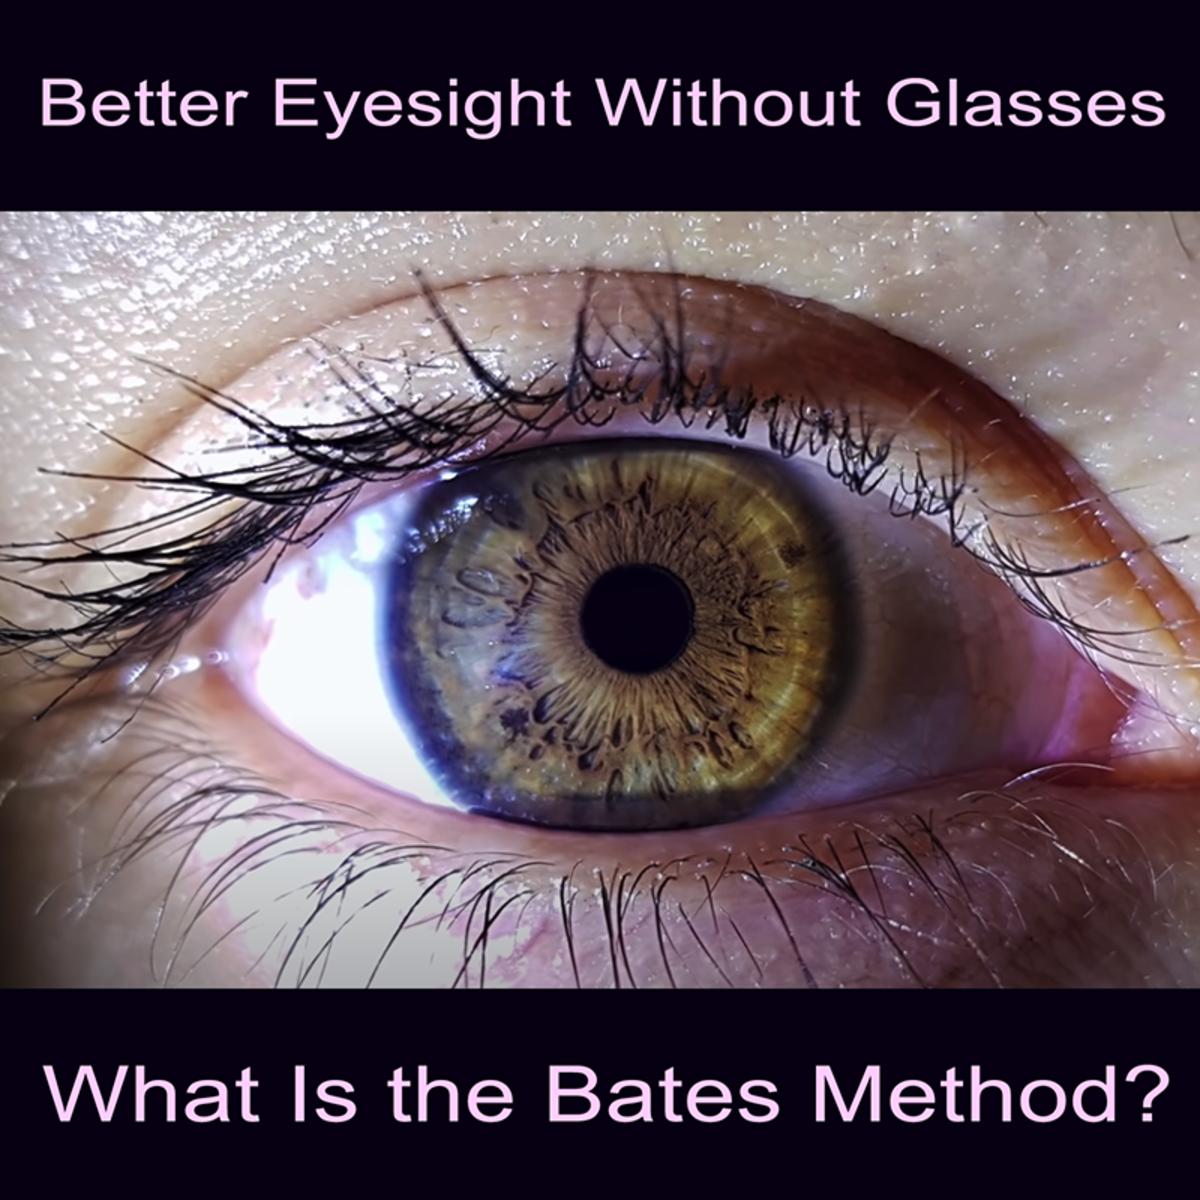 bates-method-for-better-eyesight-without-glasses